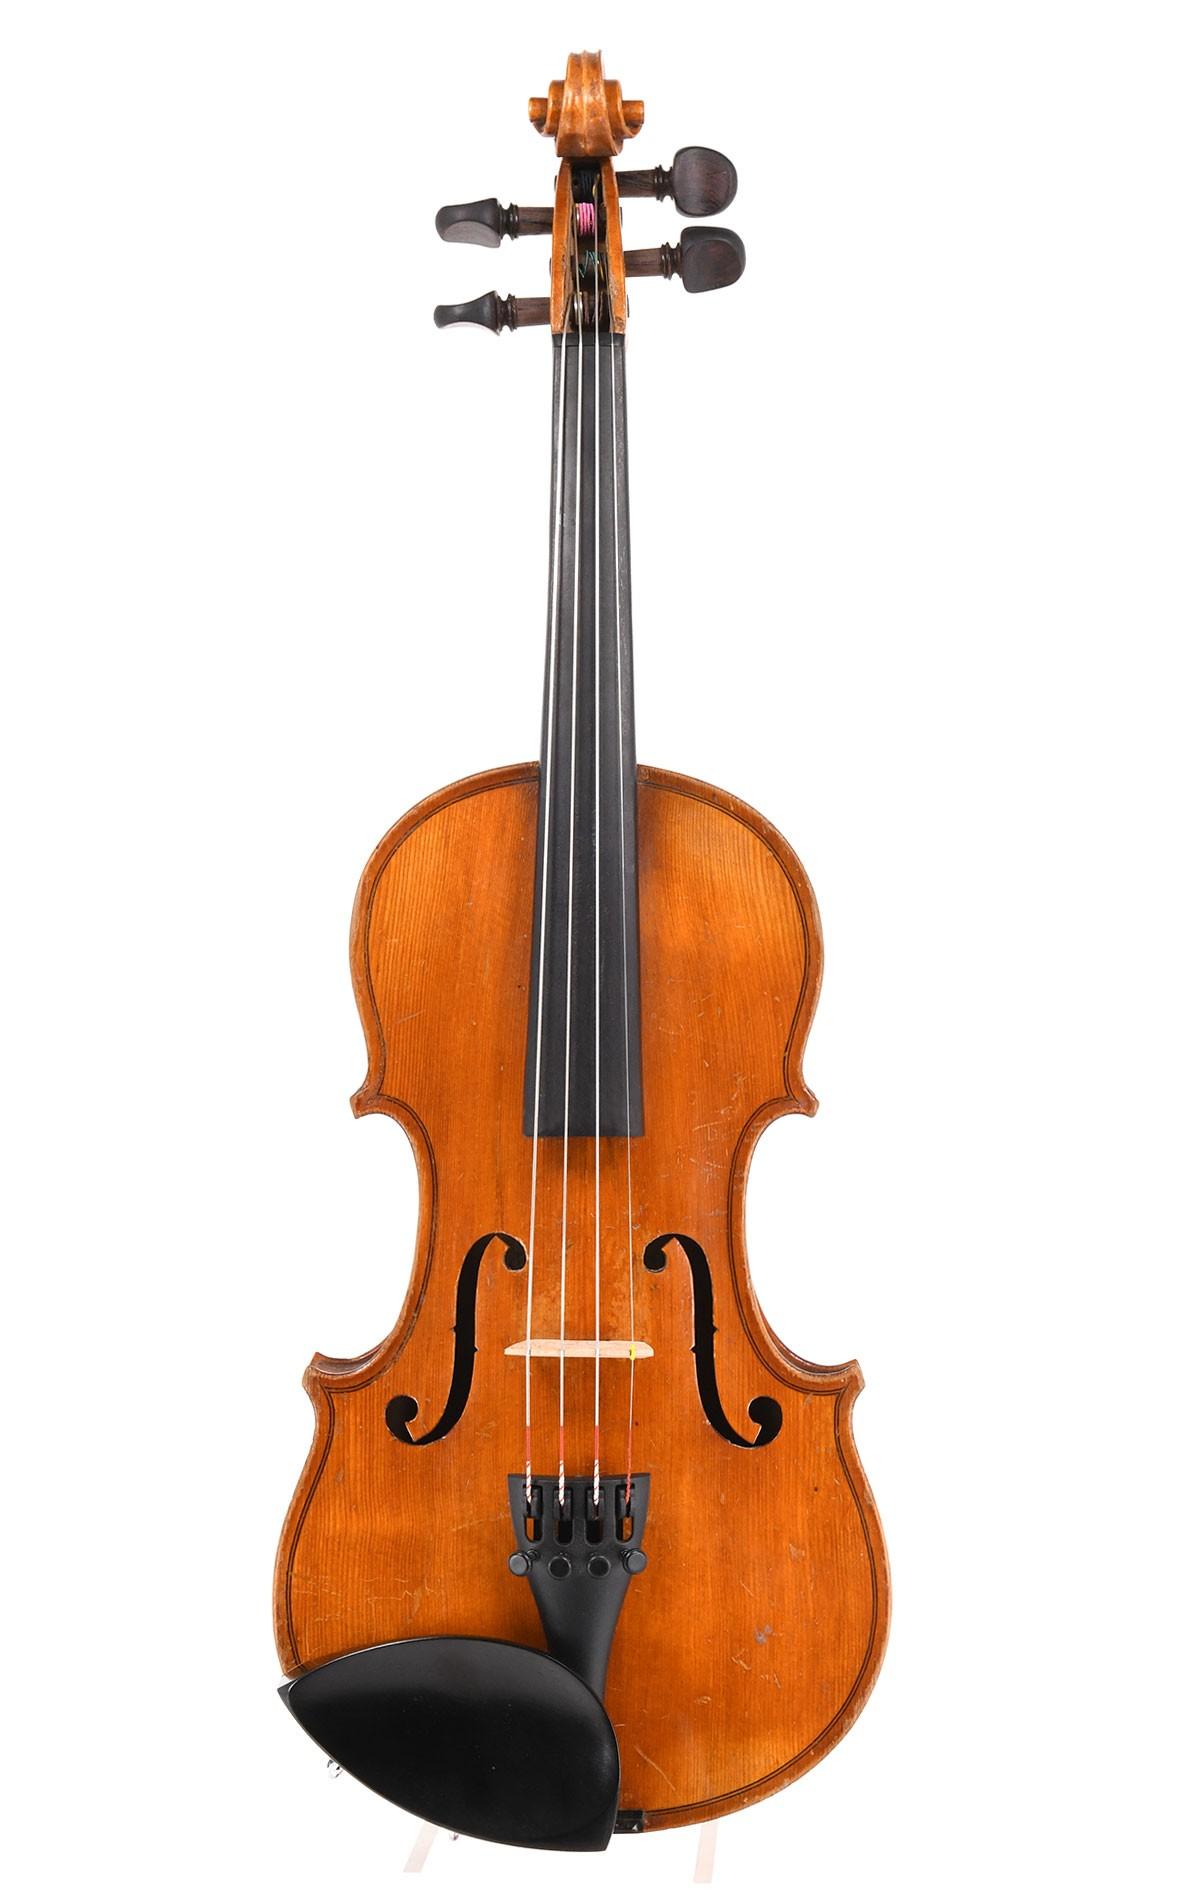 Petite 1/2 violin or large 1/4 violin intermediate size